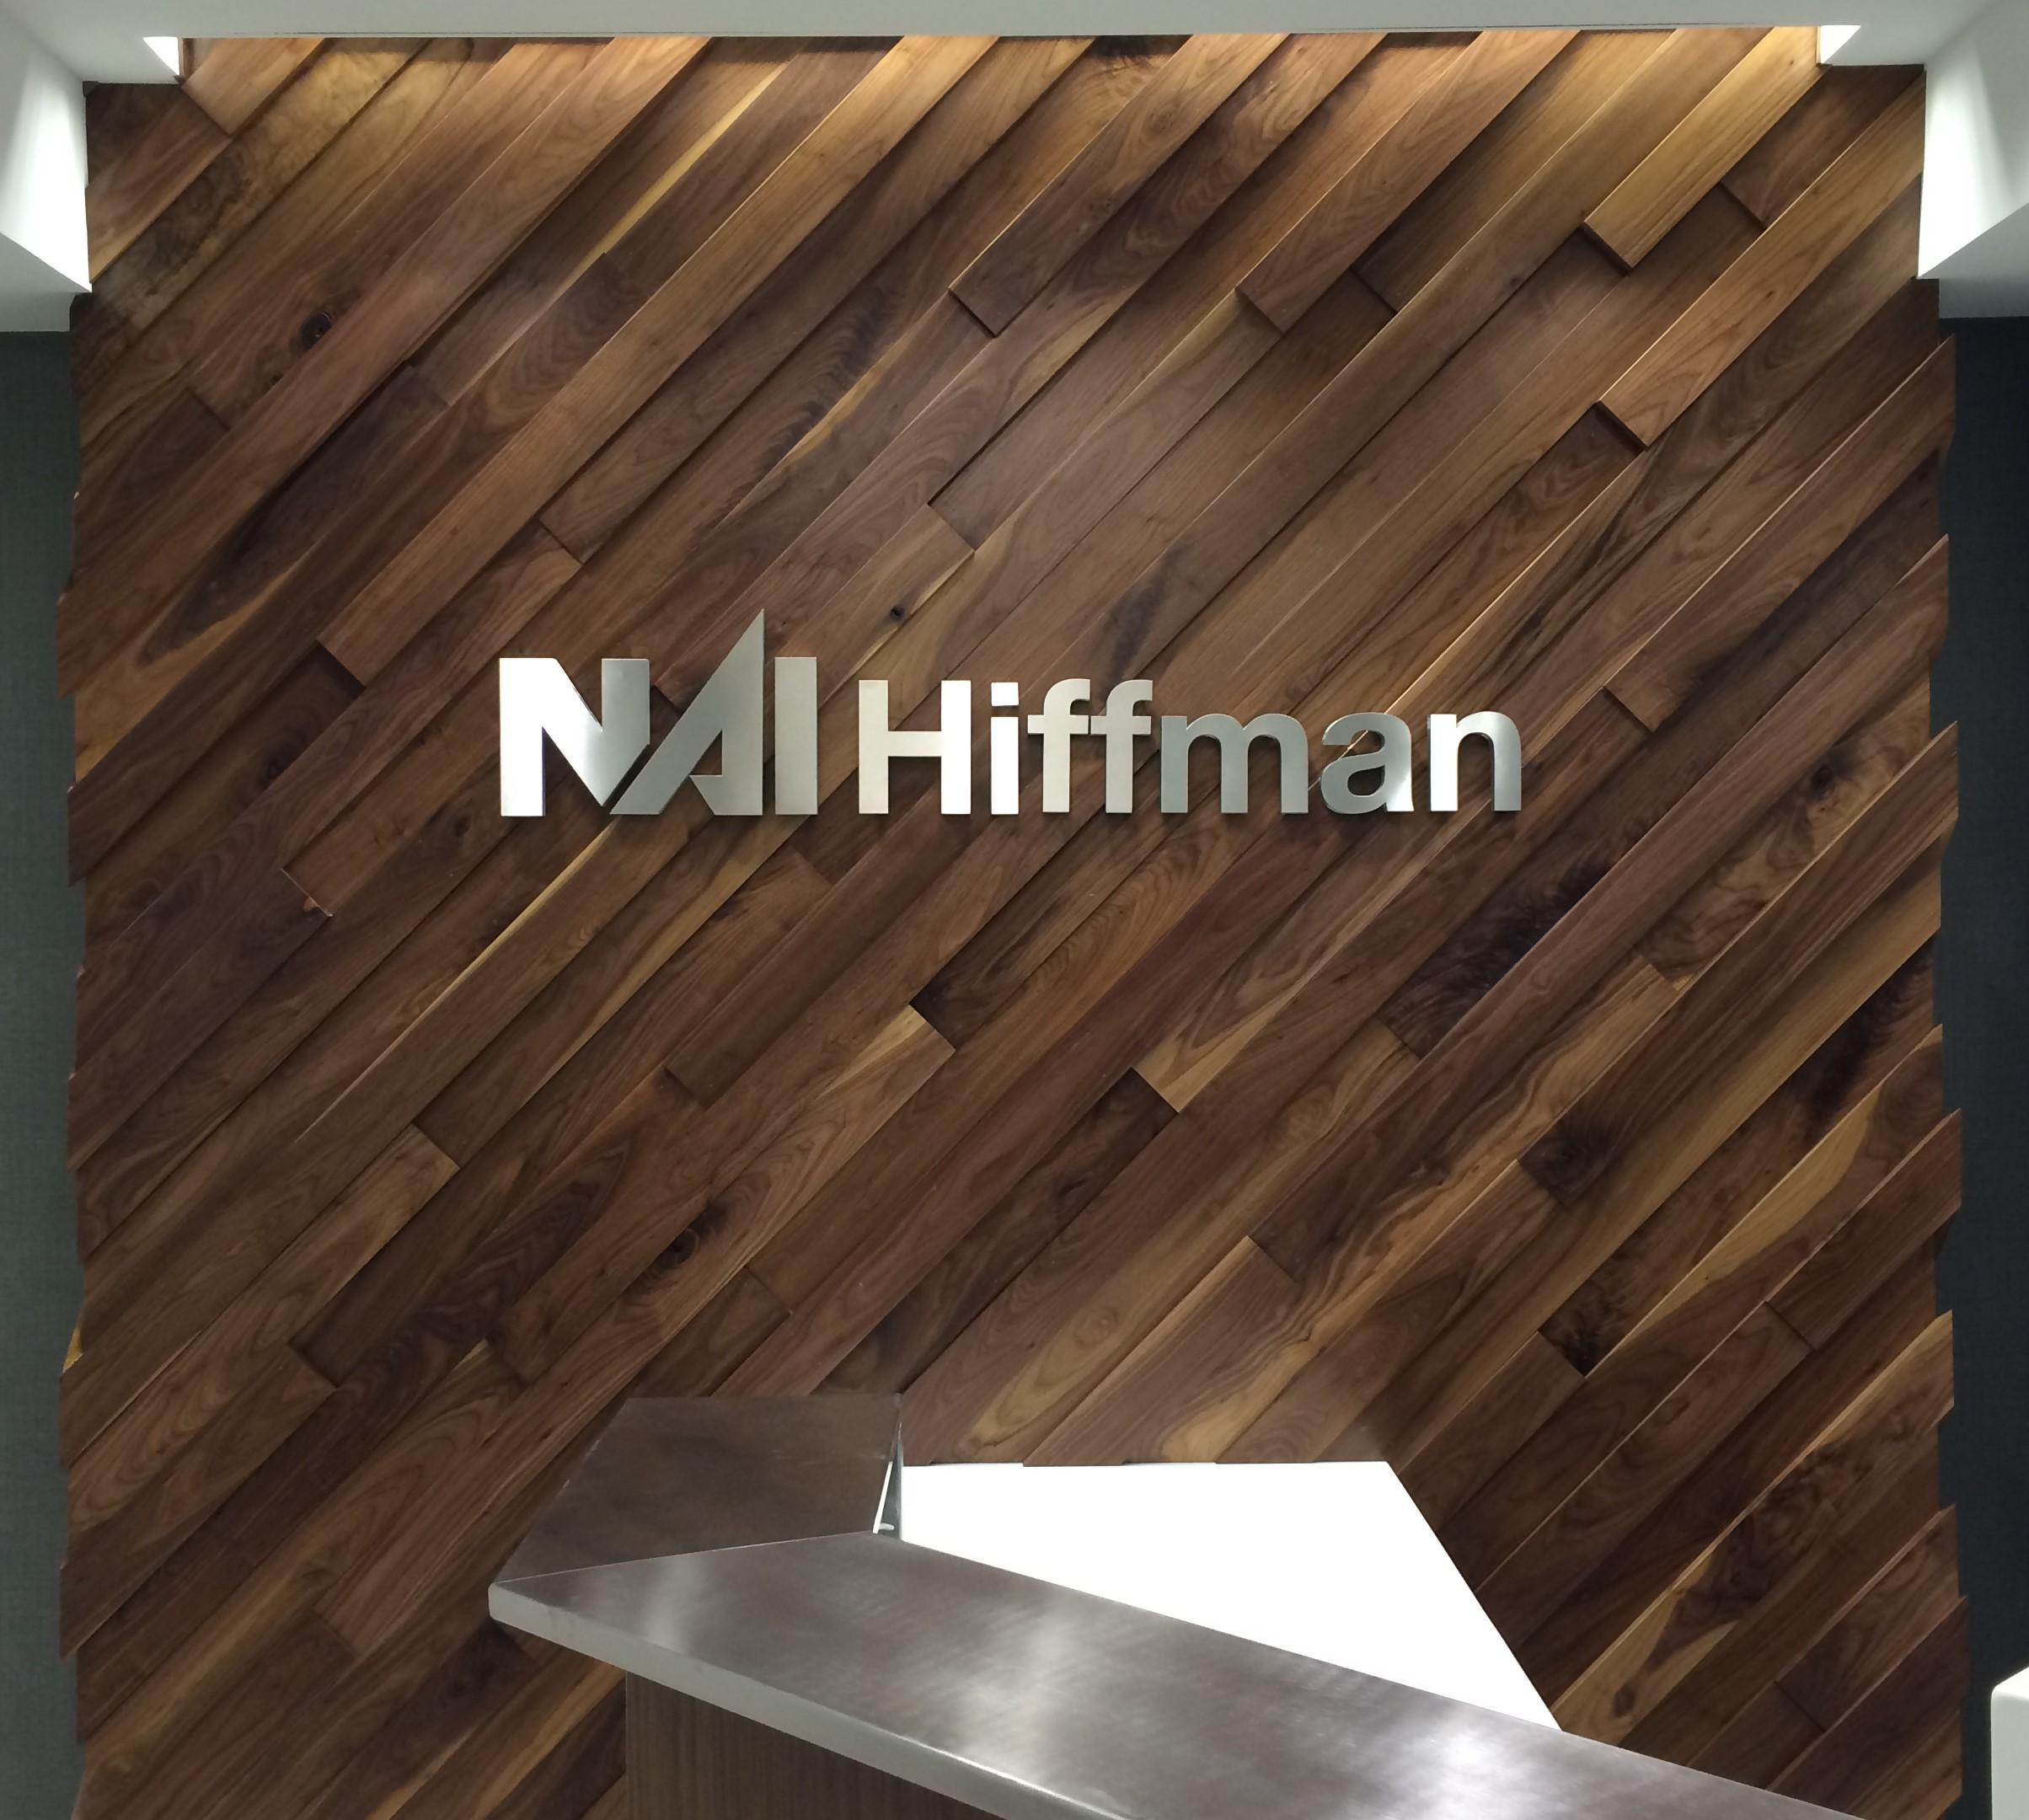 NAI Hiffman Metal Lobby Sign